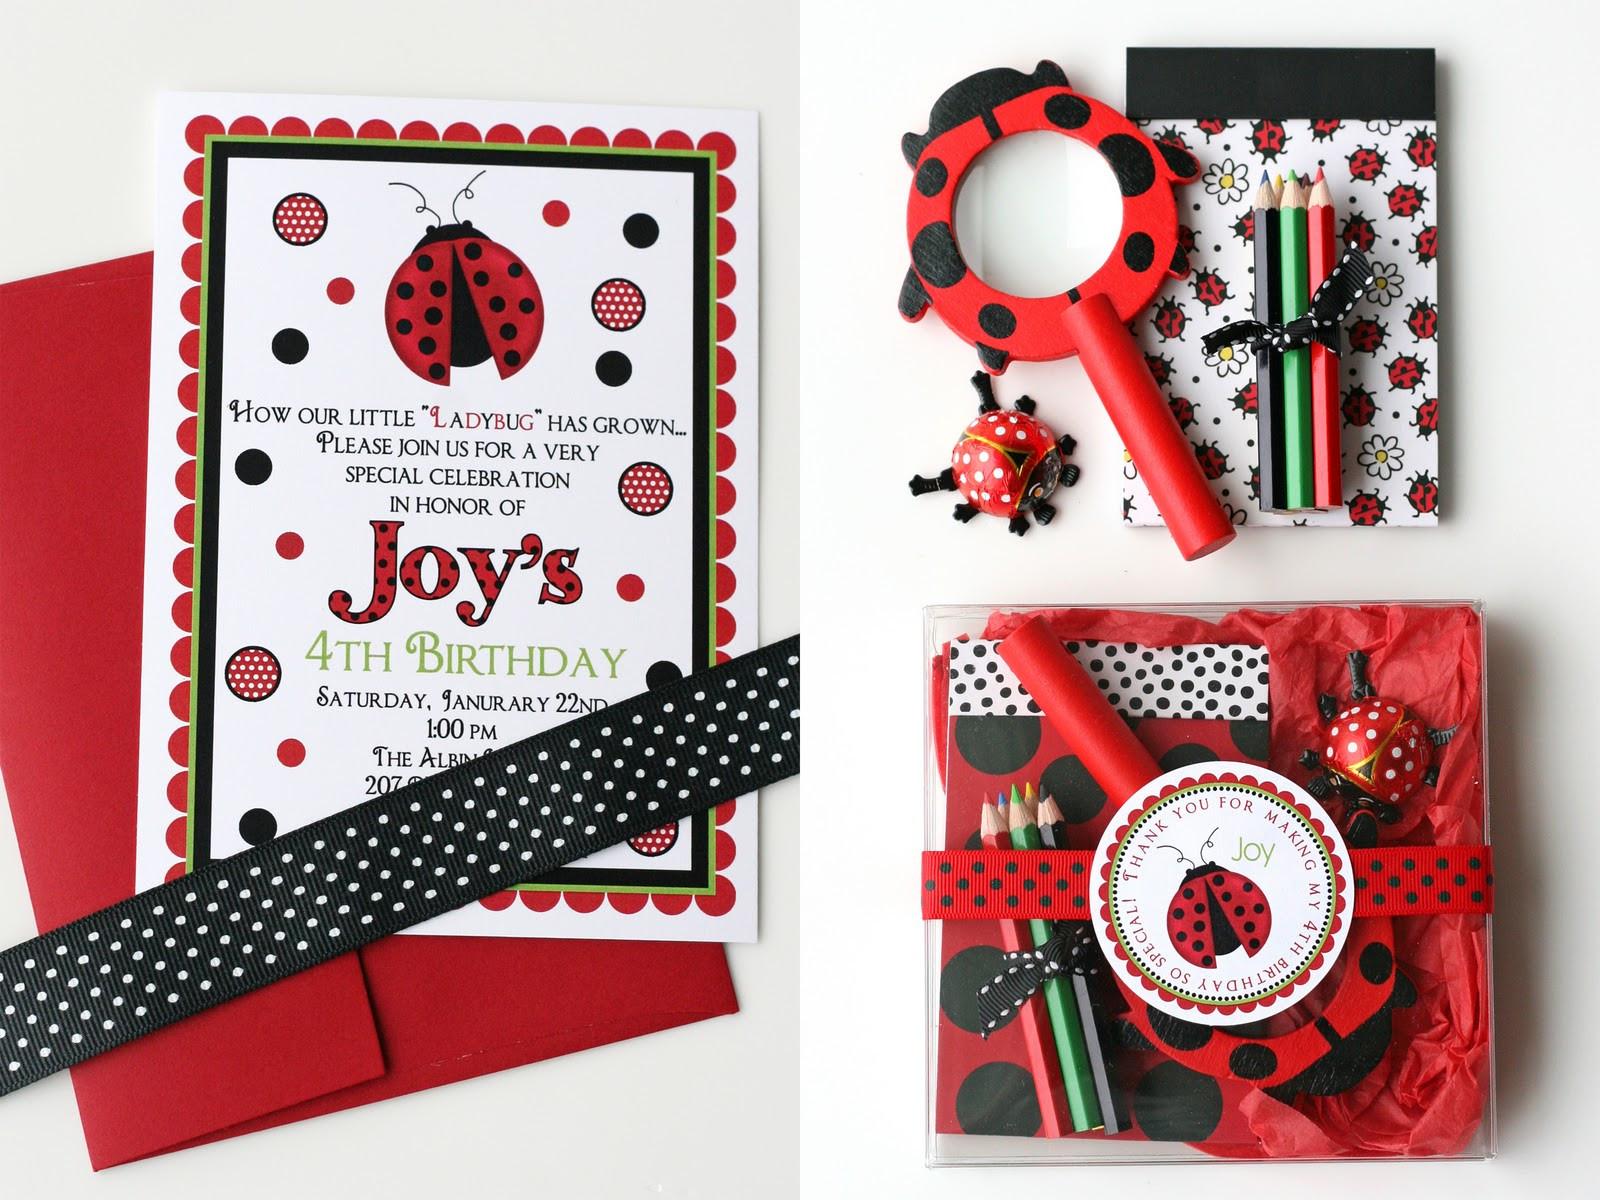 Best ideas about Ladybug Birthday Party . Save or Pin Joy's Ladybug Birthday – Glorious Treats Now.